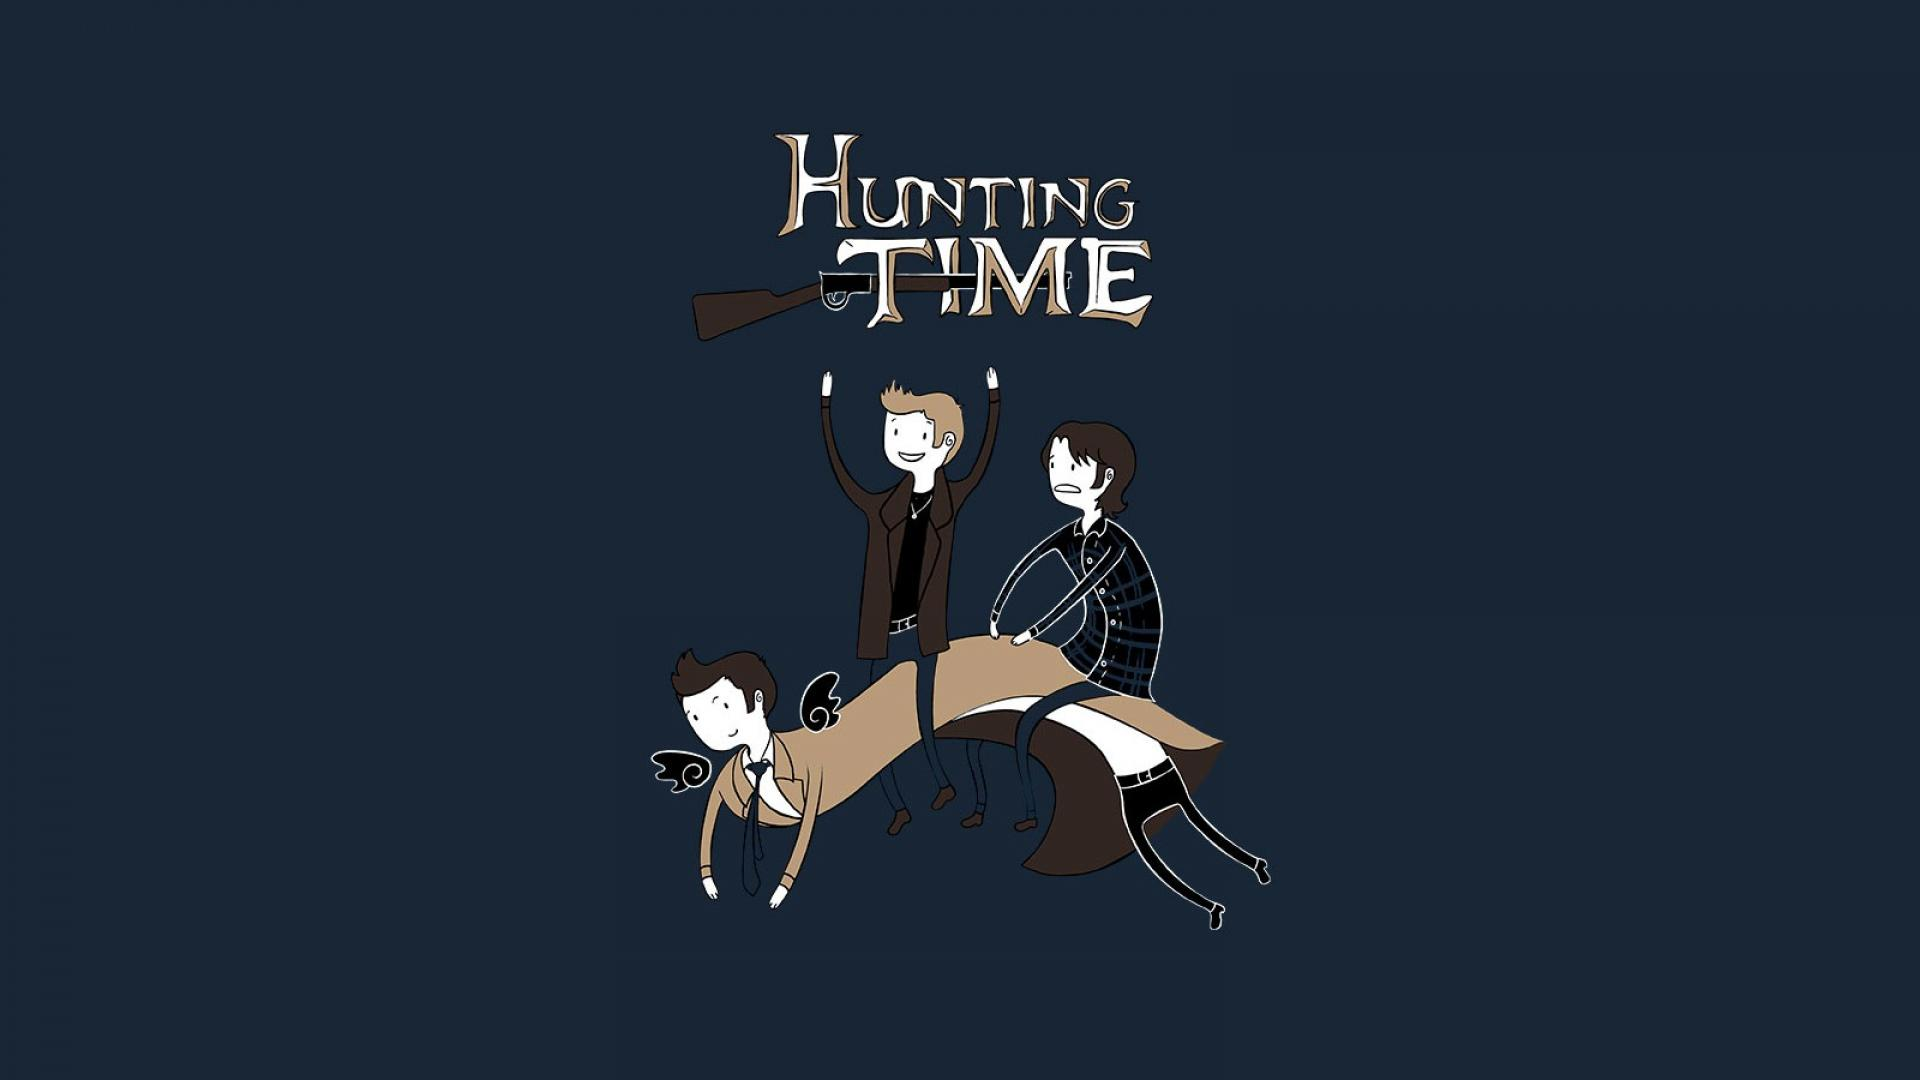 Supernatural Funny 125471 Hd Wallpaper Backgrounds Download